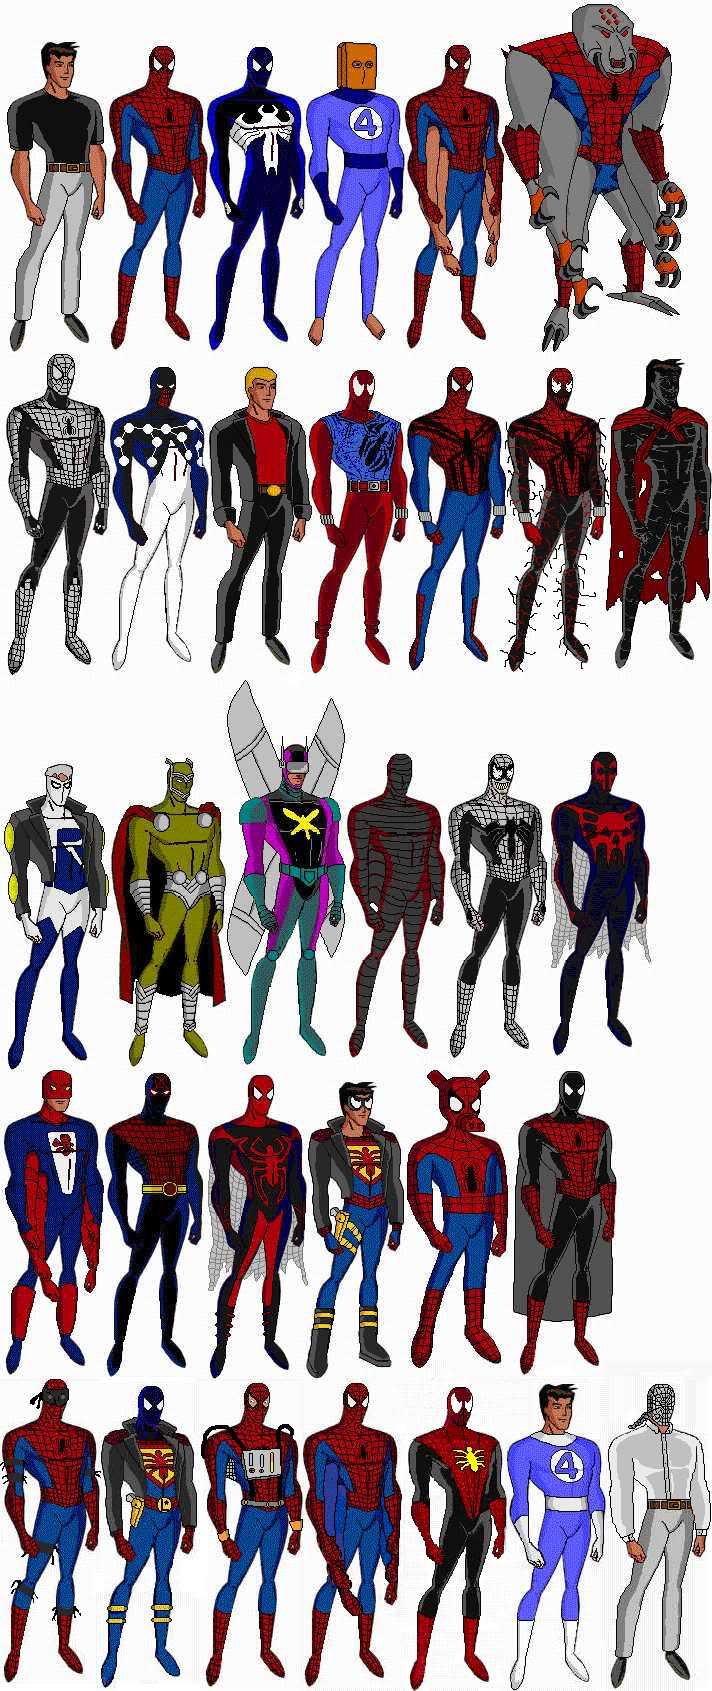 PETER PARKER / SPIDERMAN Costumes